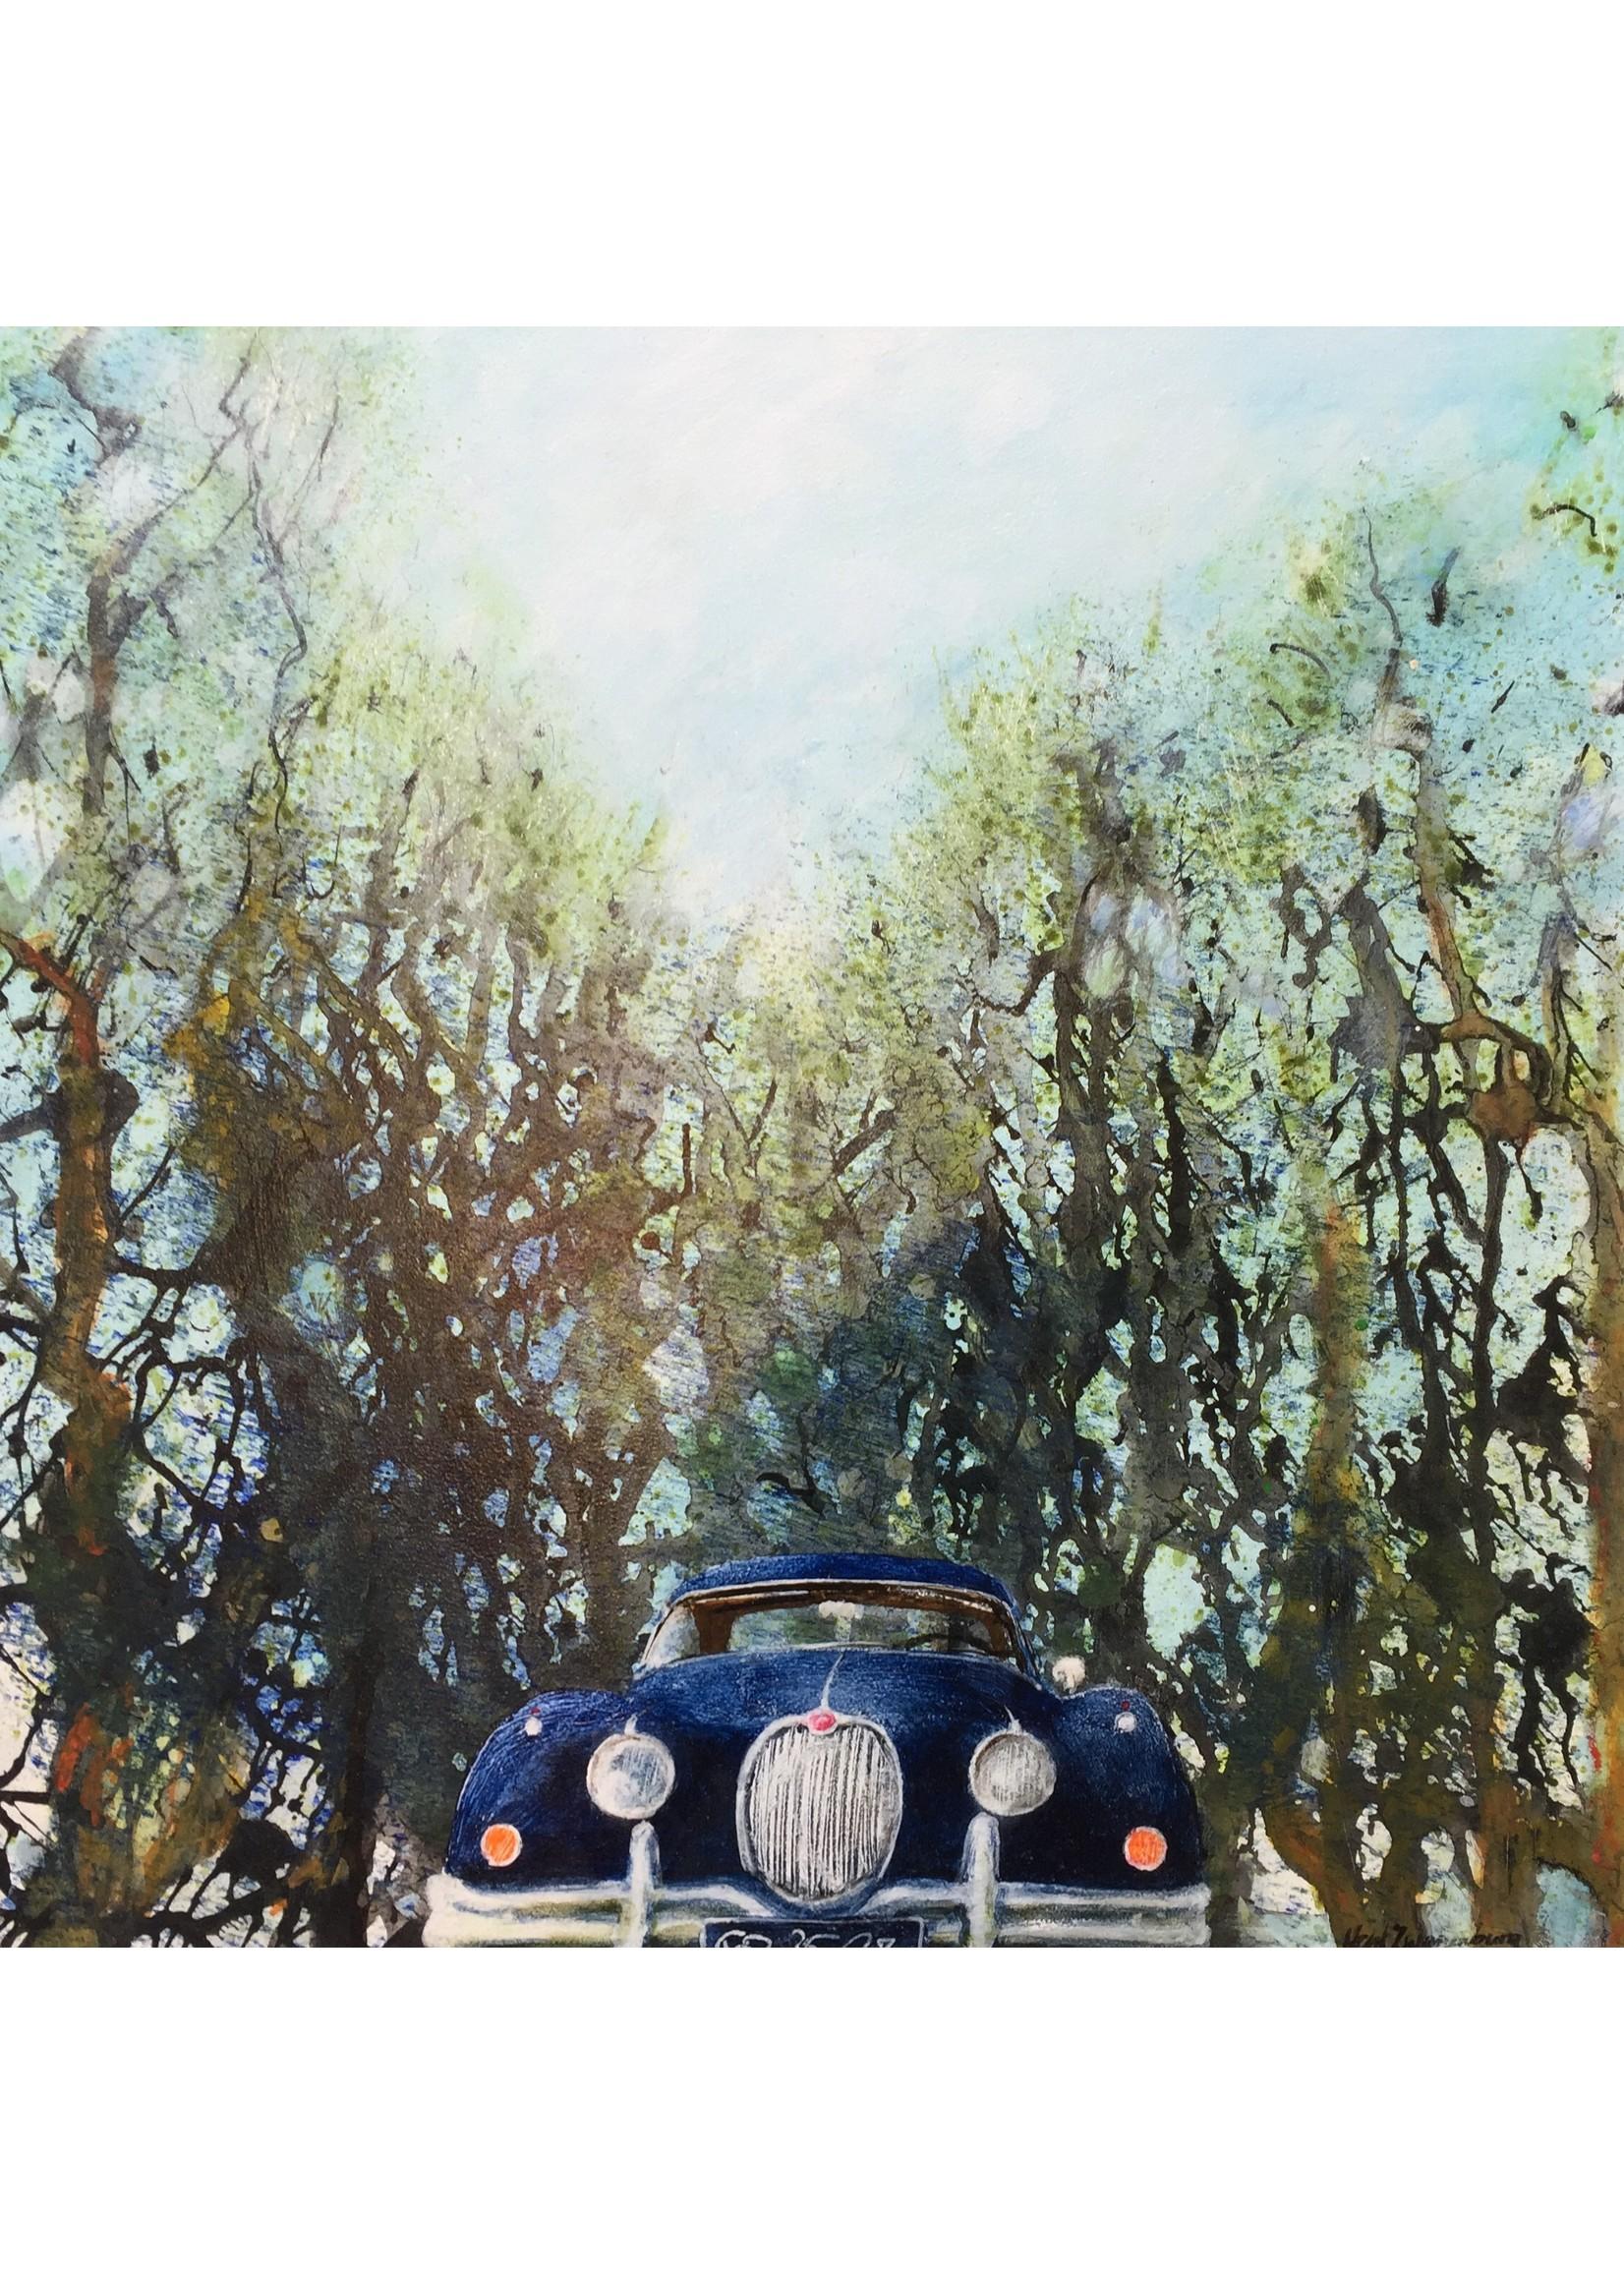 'Driveway'(Jaguar XK)' - Henk Zwanenburg (acrylic on panel)